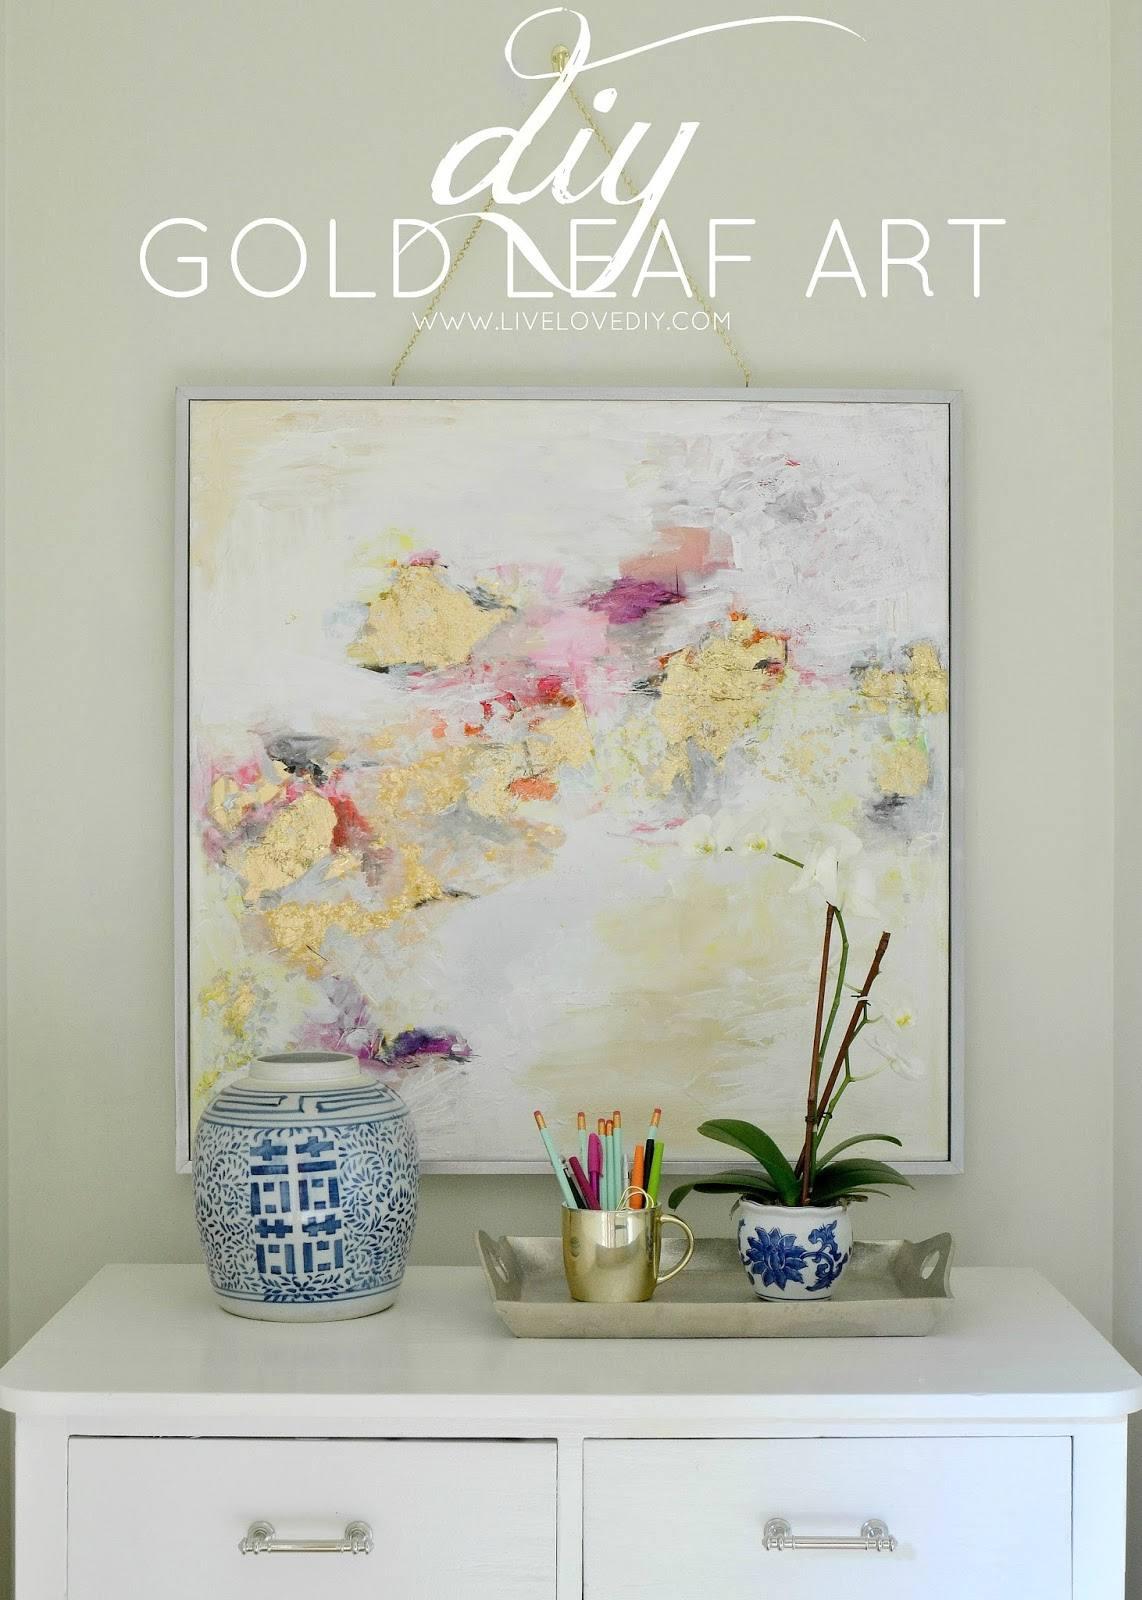 Gold Leaf Art